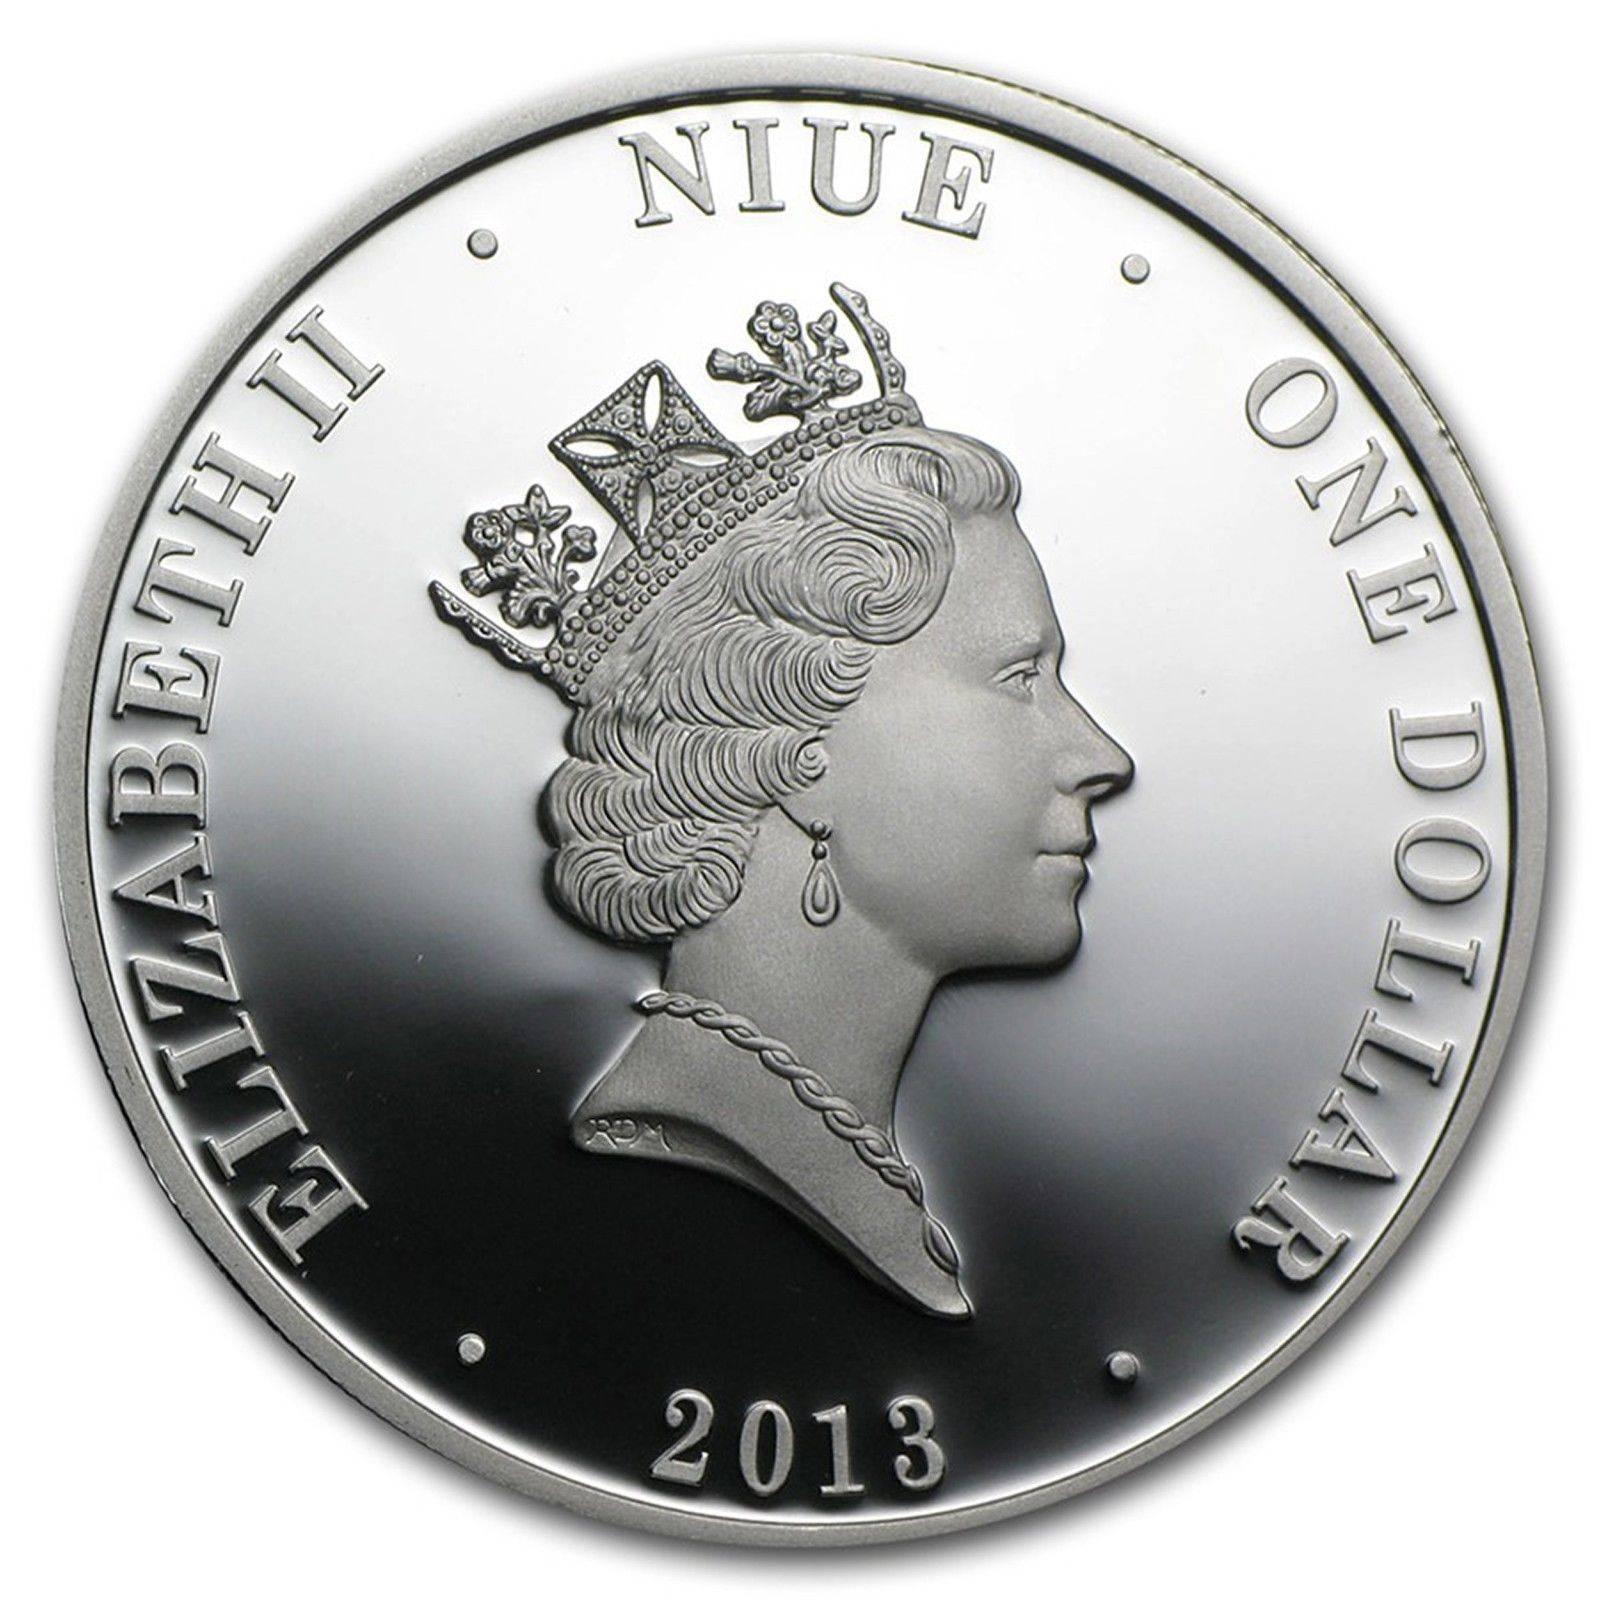 Australia Niue 1 Dollar Silver Proof Coin 2013 Oil